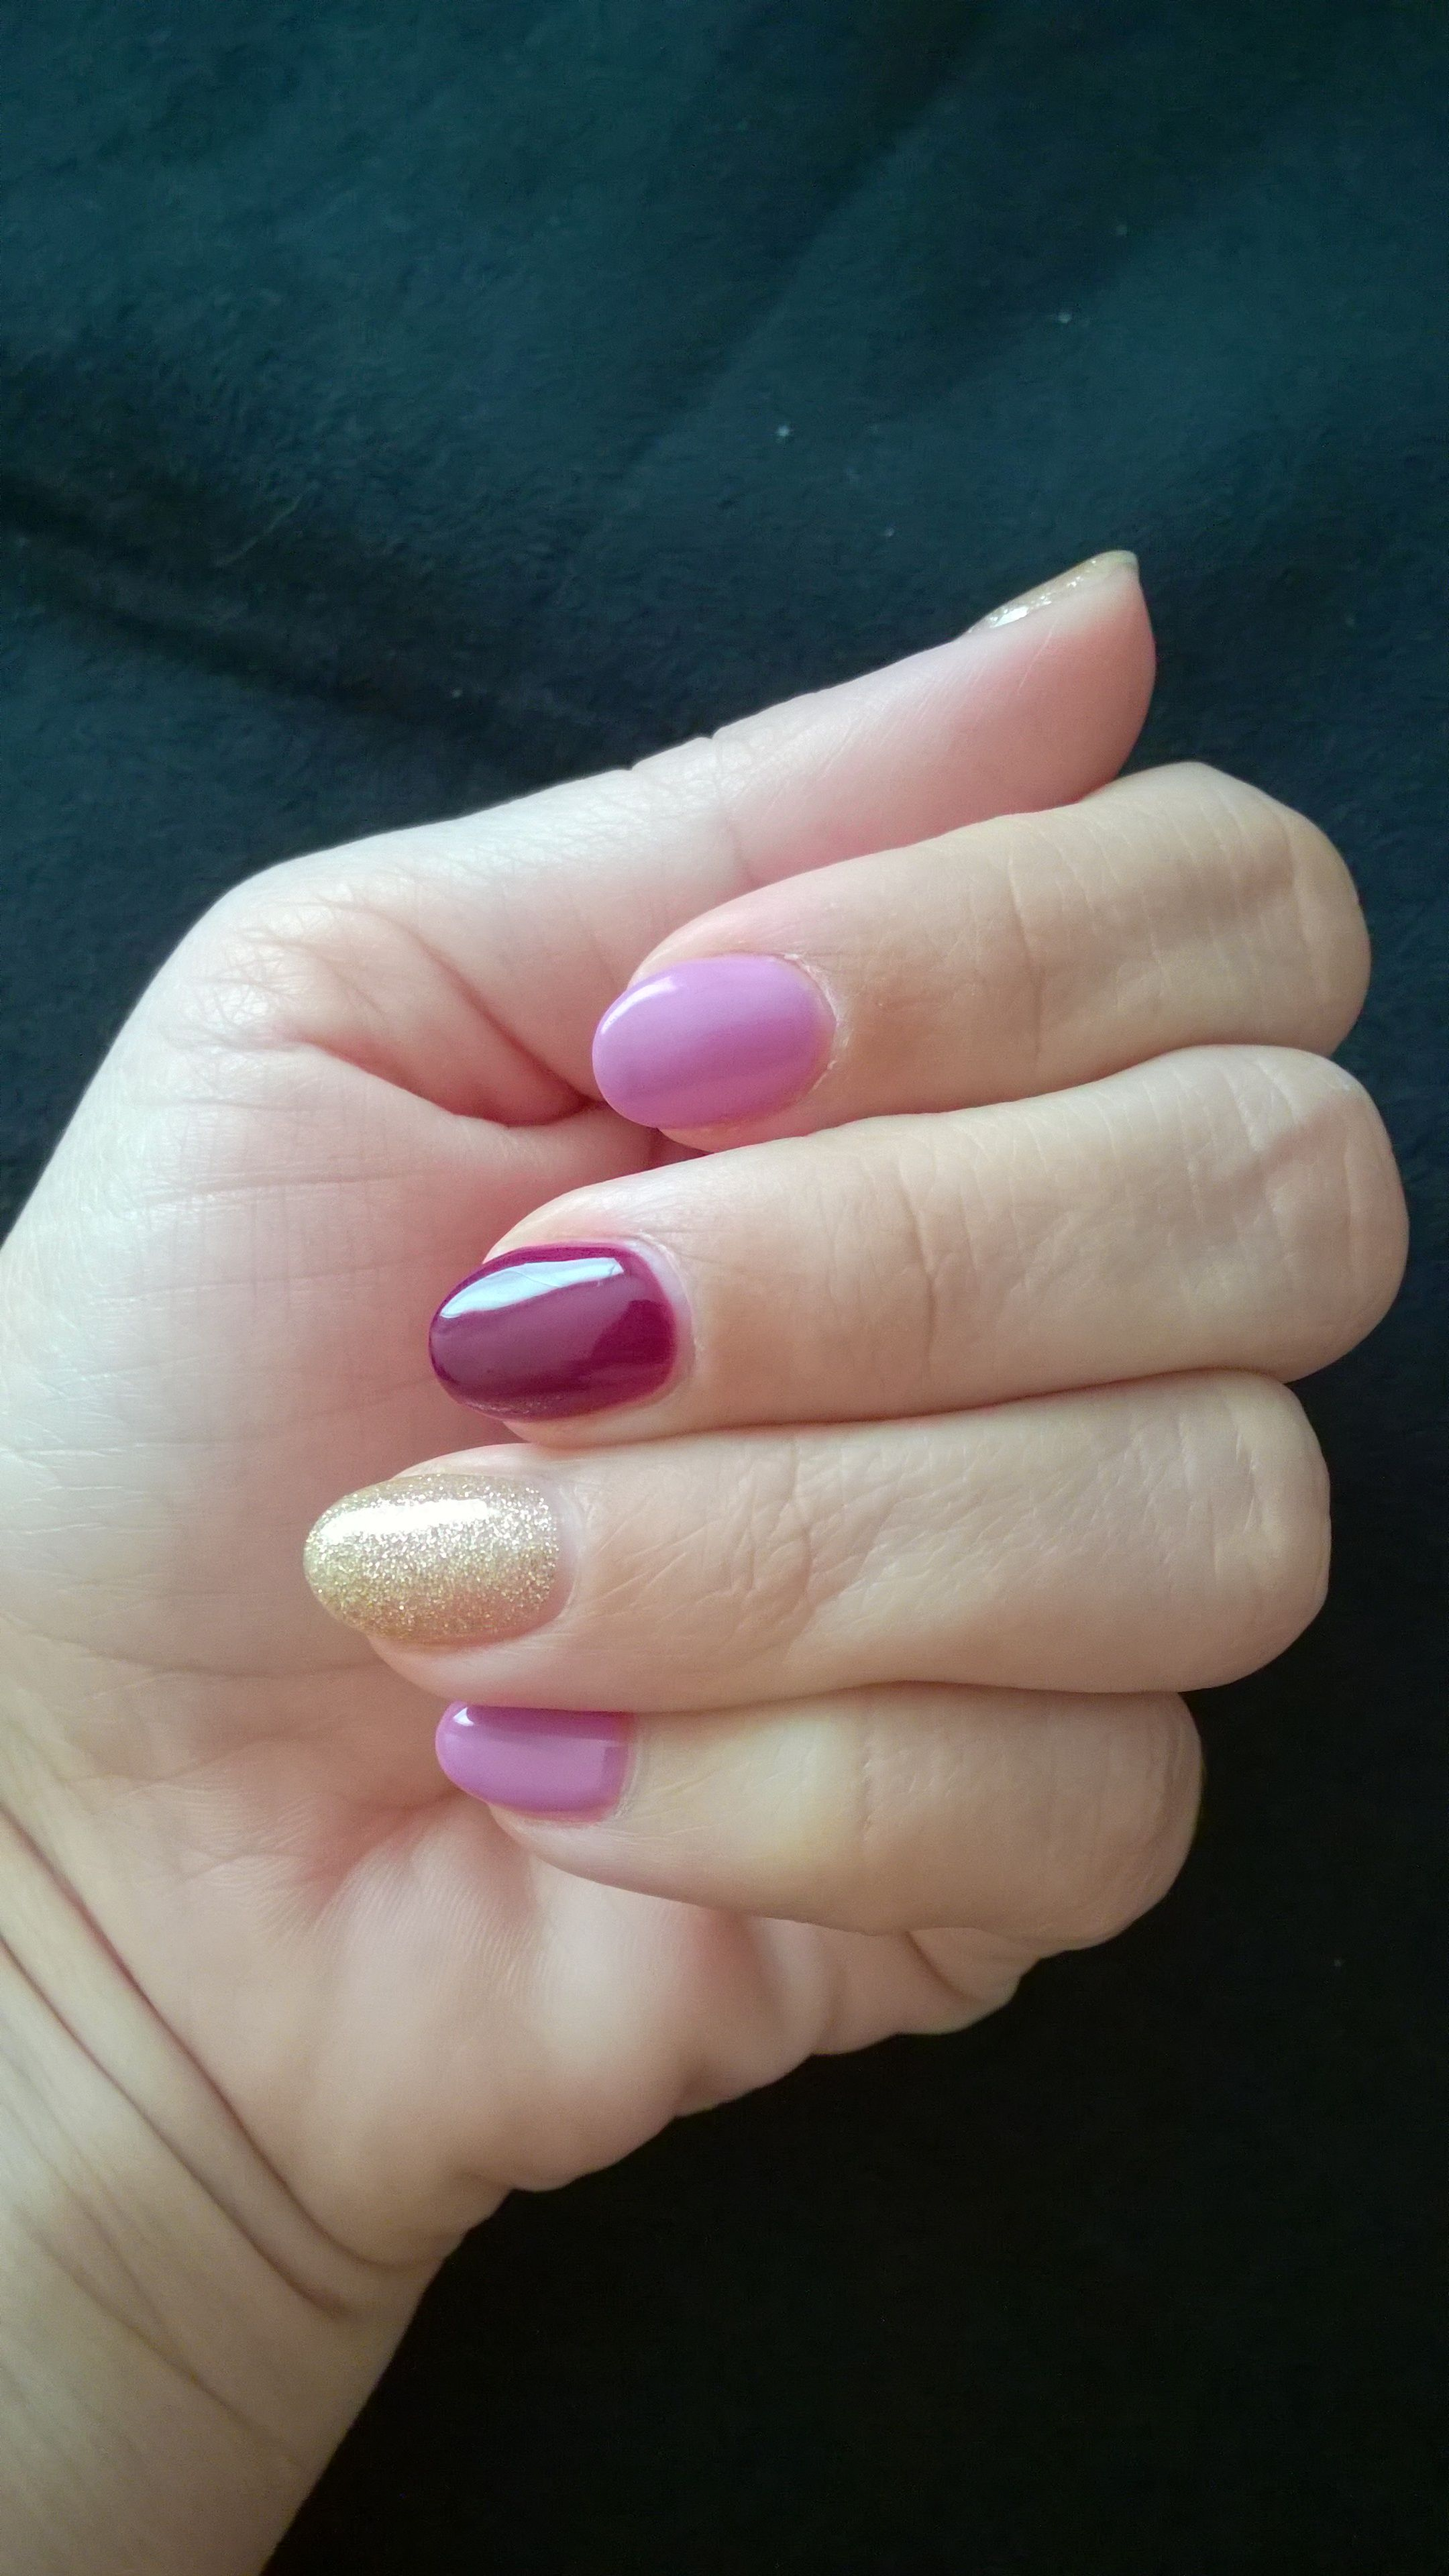 Short Almond Shaped Nails Purple And Gold Nail Color Matte Pink Nails Gold Glitter Nails Pink Nail Designs